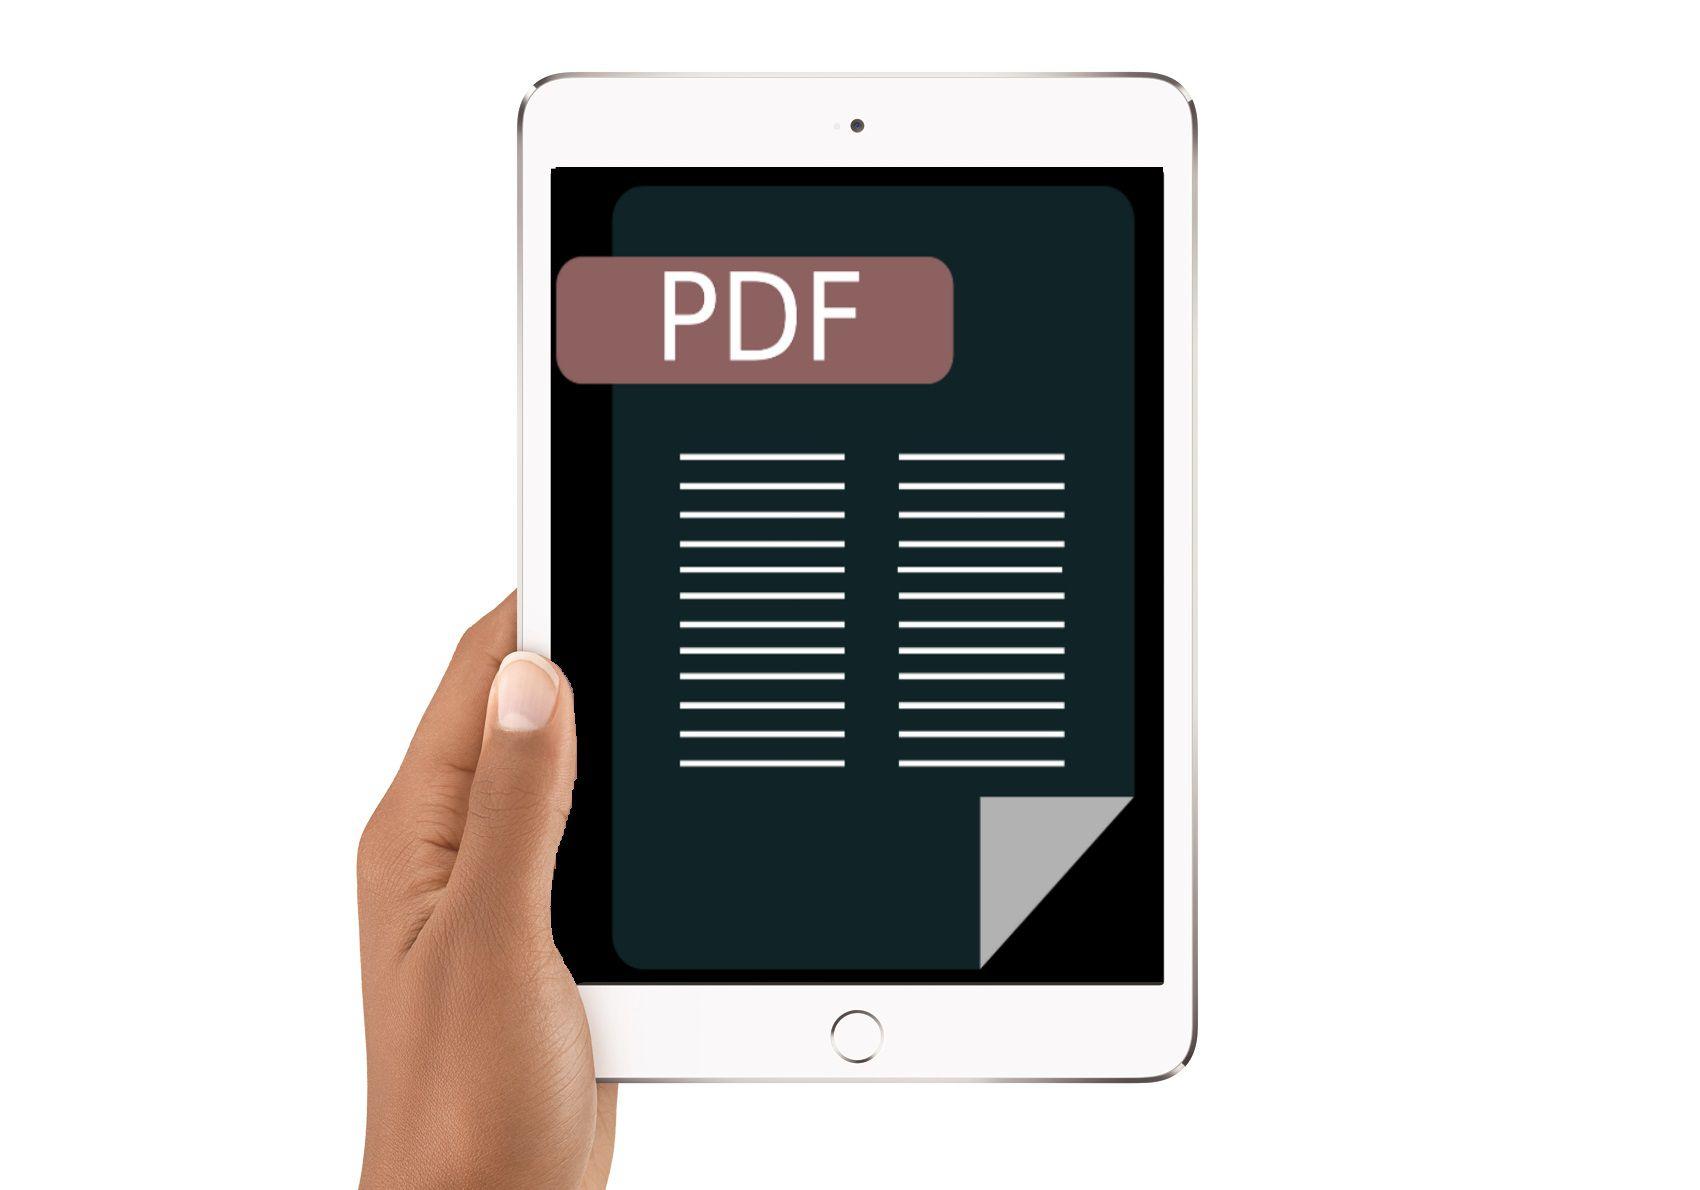 iPad with PDF image on the screen